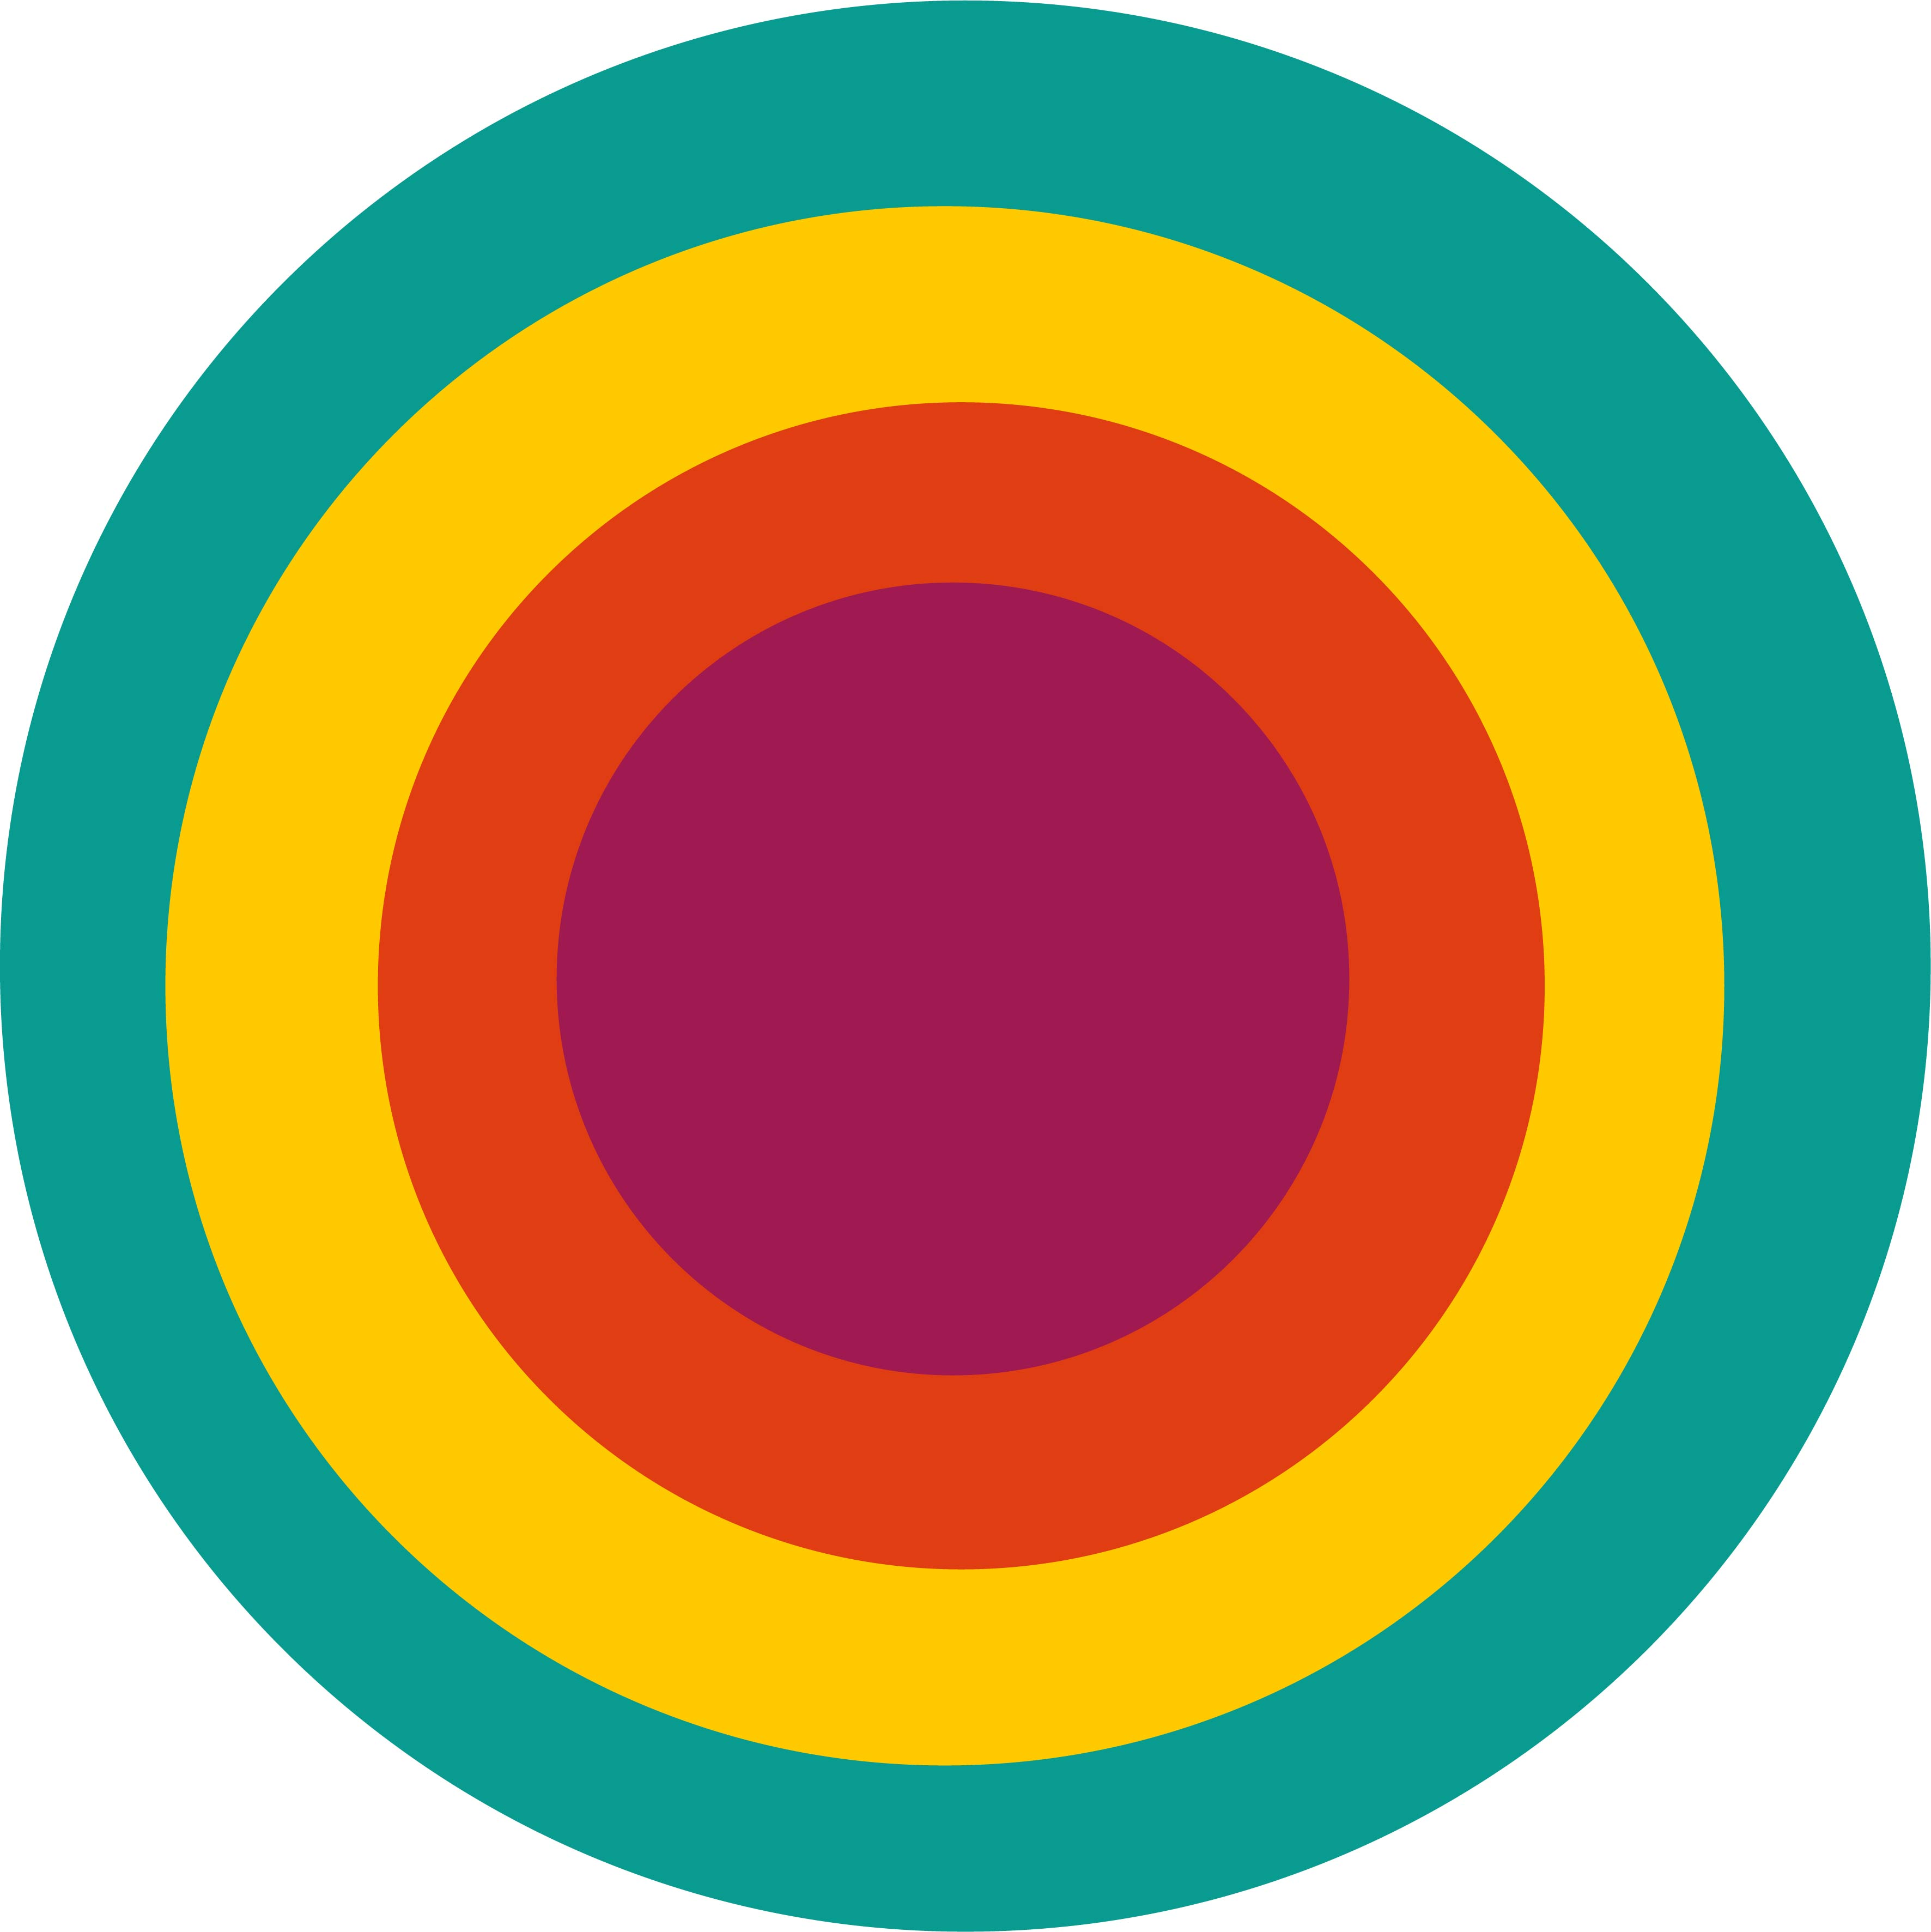 dWOW logo